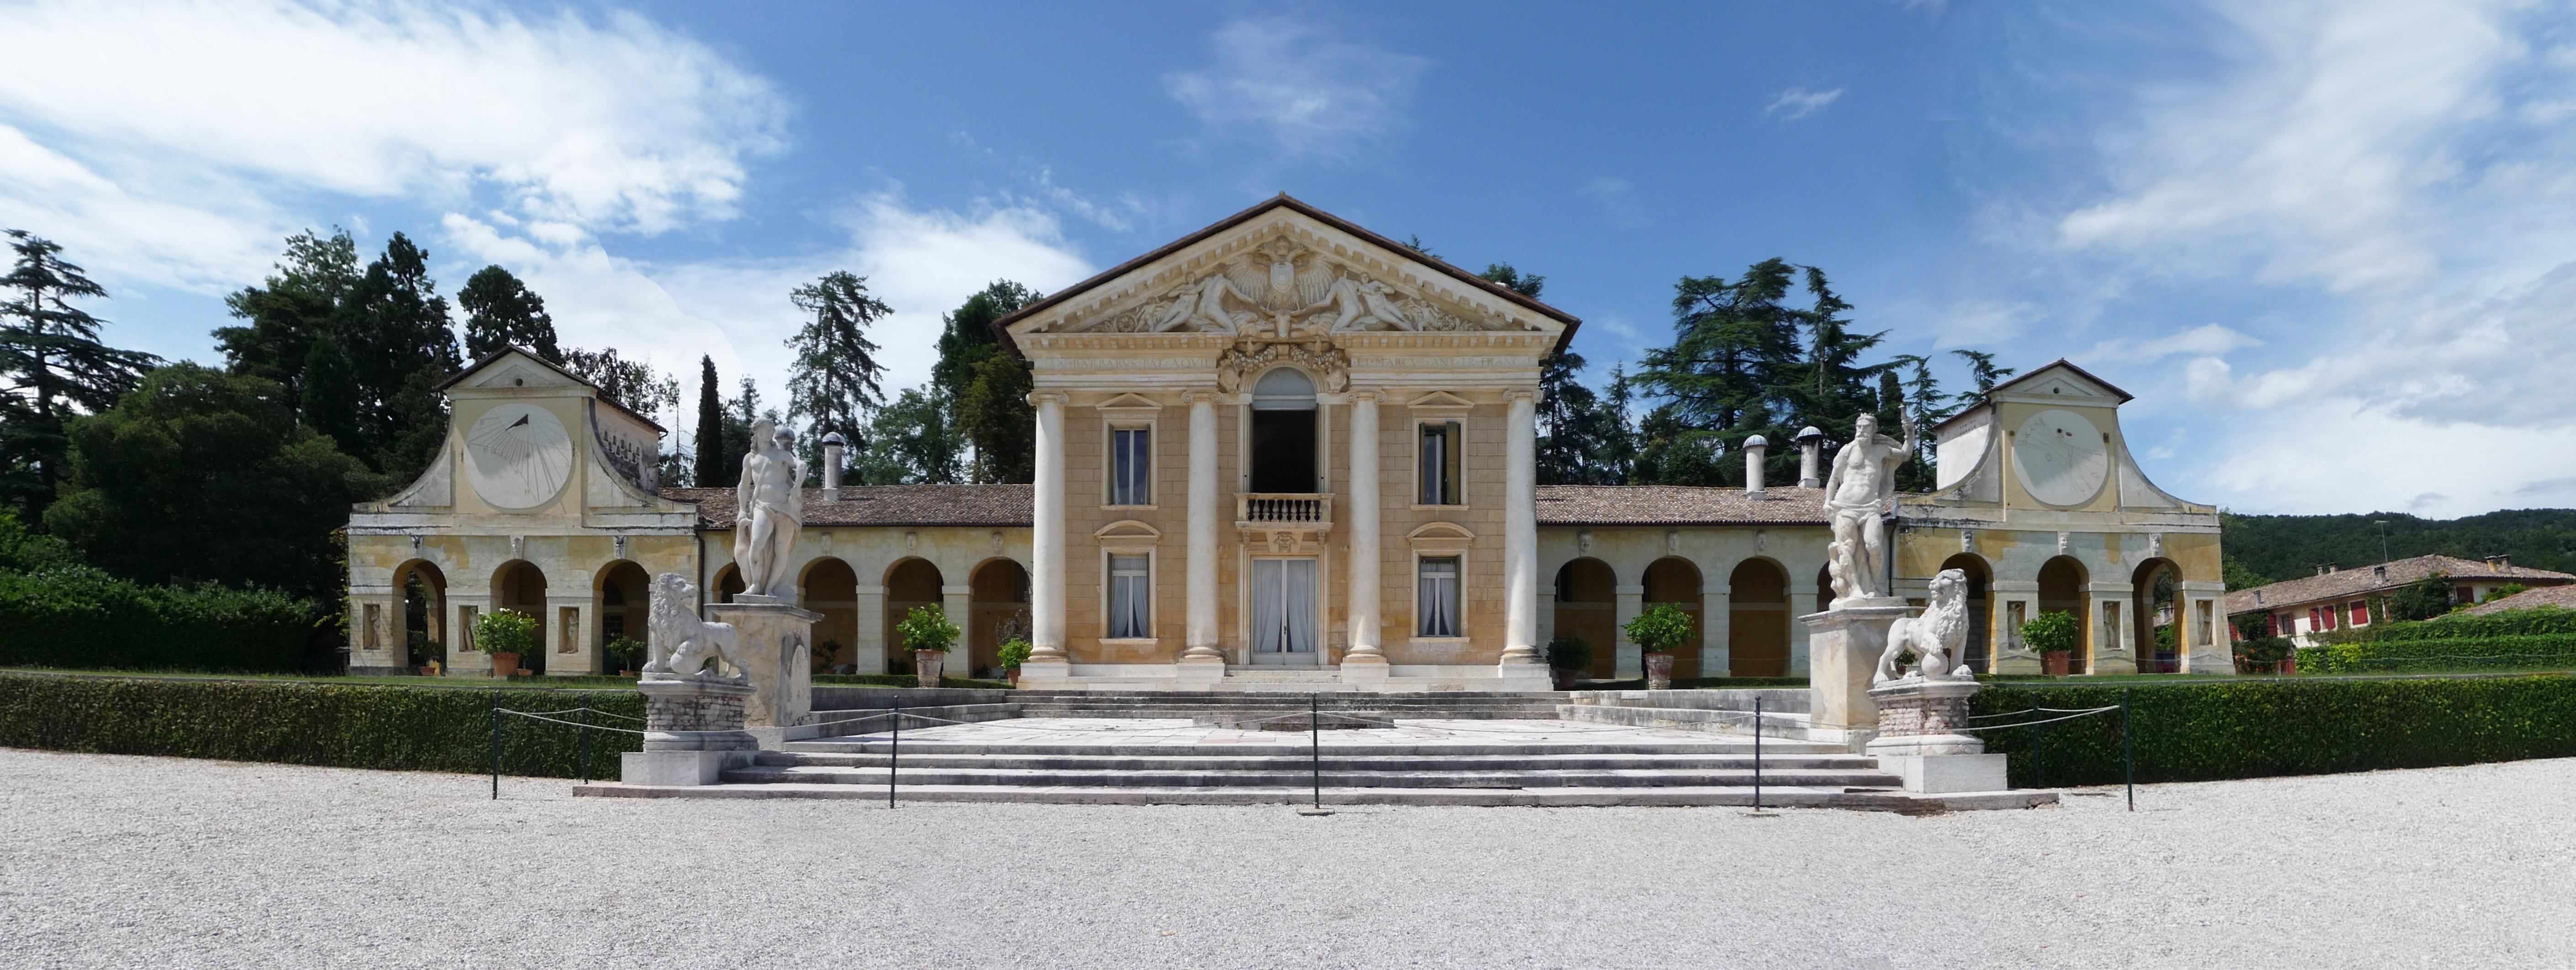 Villa_Barbaro_panoramica_fronte_Marcok.jpg